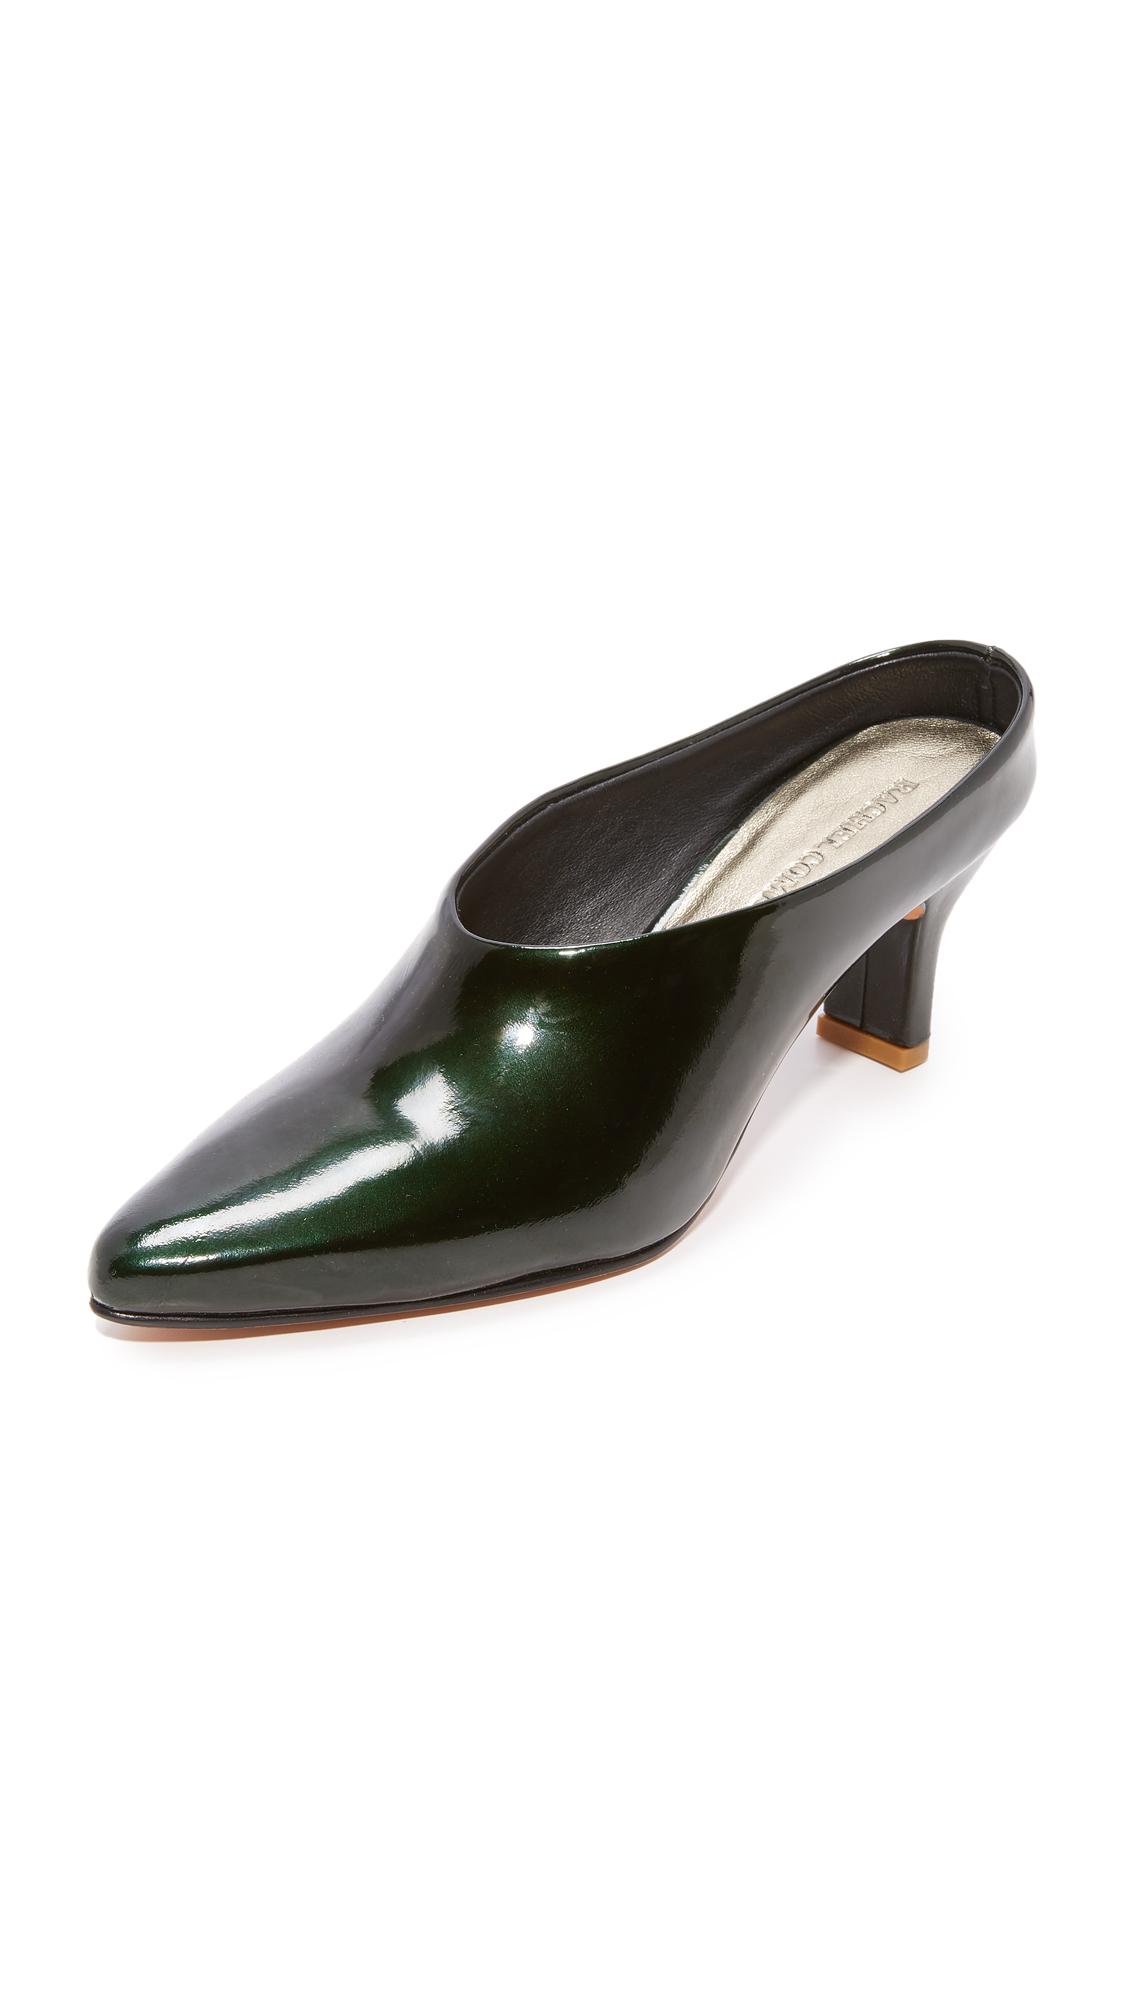 Rachel Comey Alder Mule Pumps - Emerald